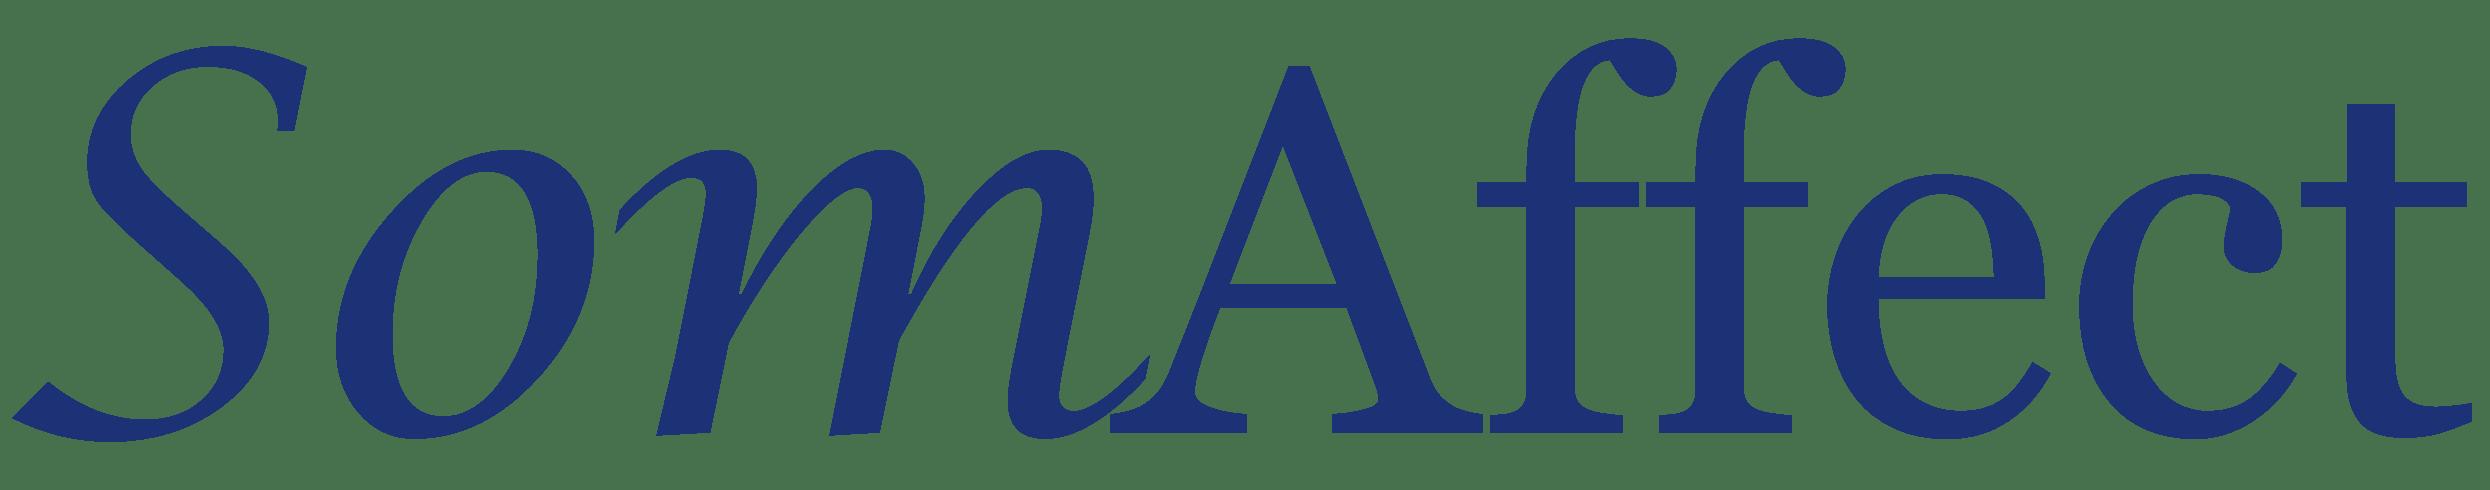 Somatosensory & Affective Neuroscience Group, LJMU